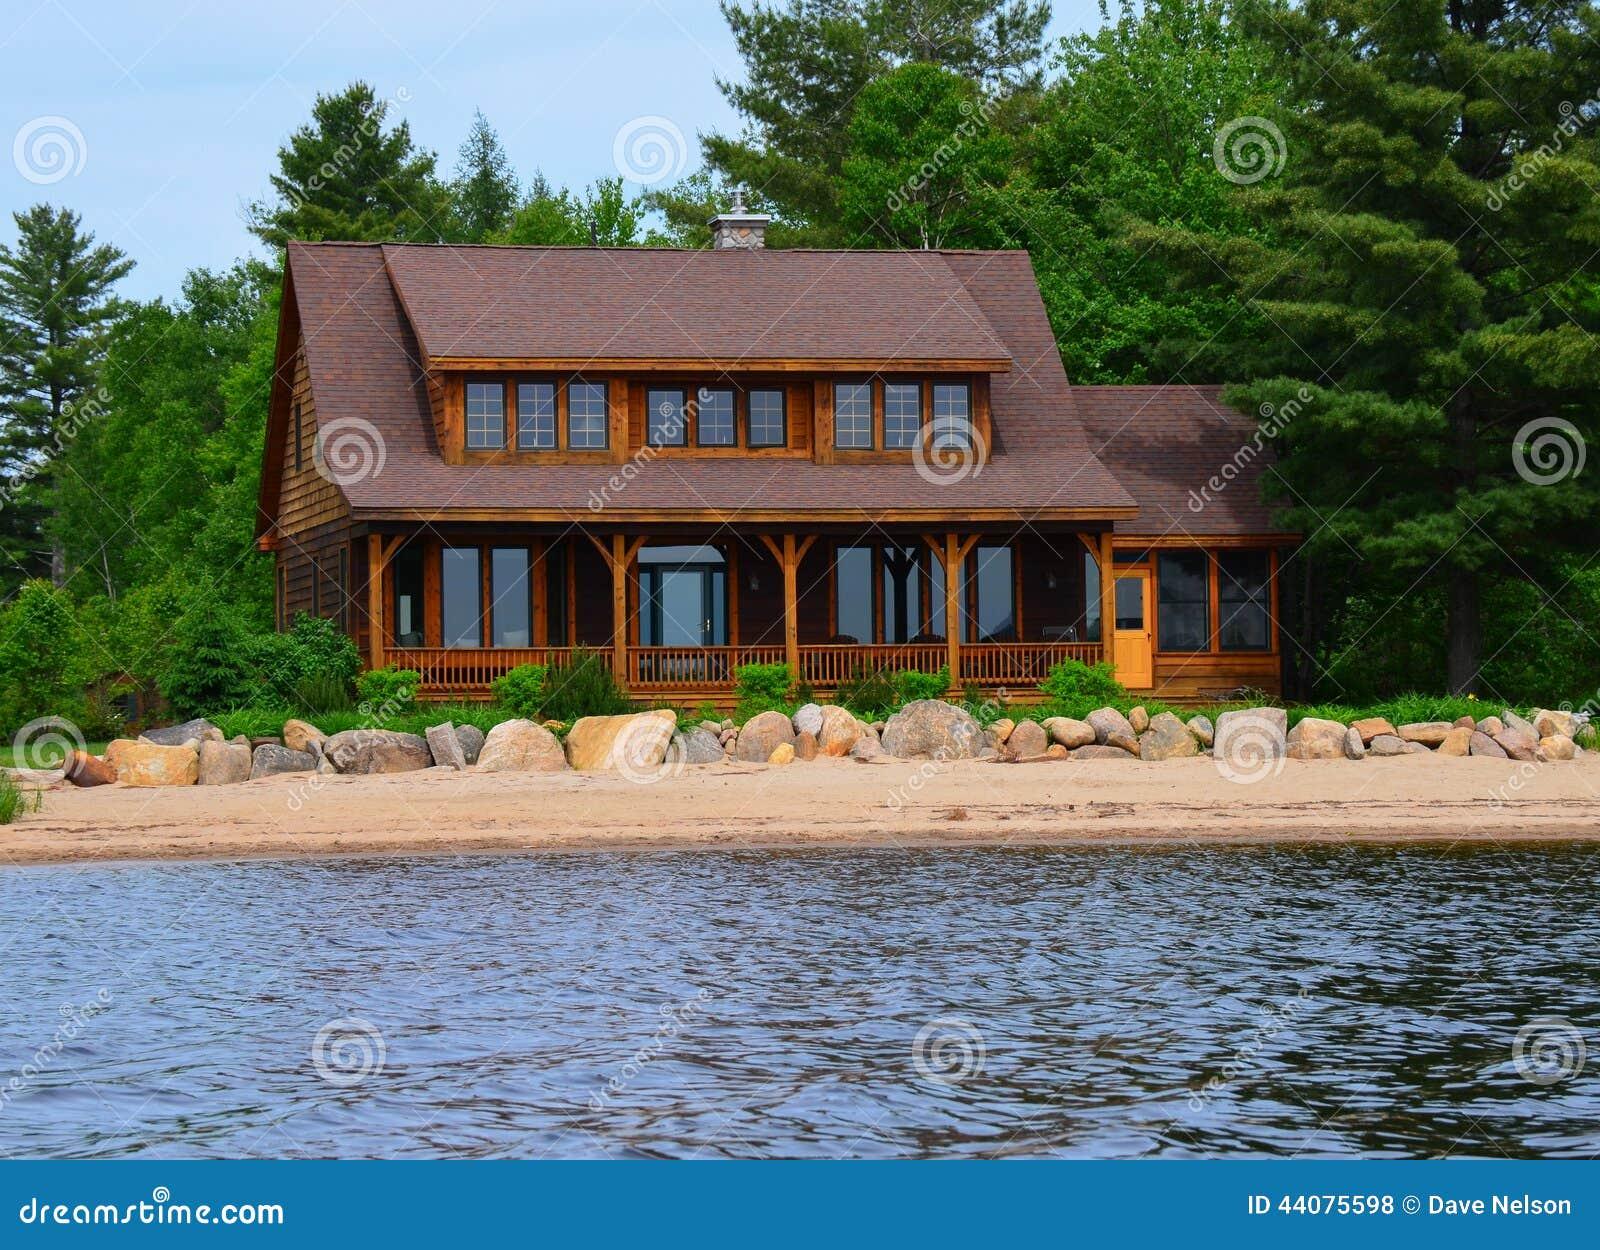 maison moderne de bord de mer photo stock image 44075598. Black Bedroom Furniture Sets. Home Design Ideas